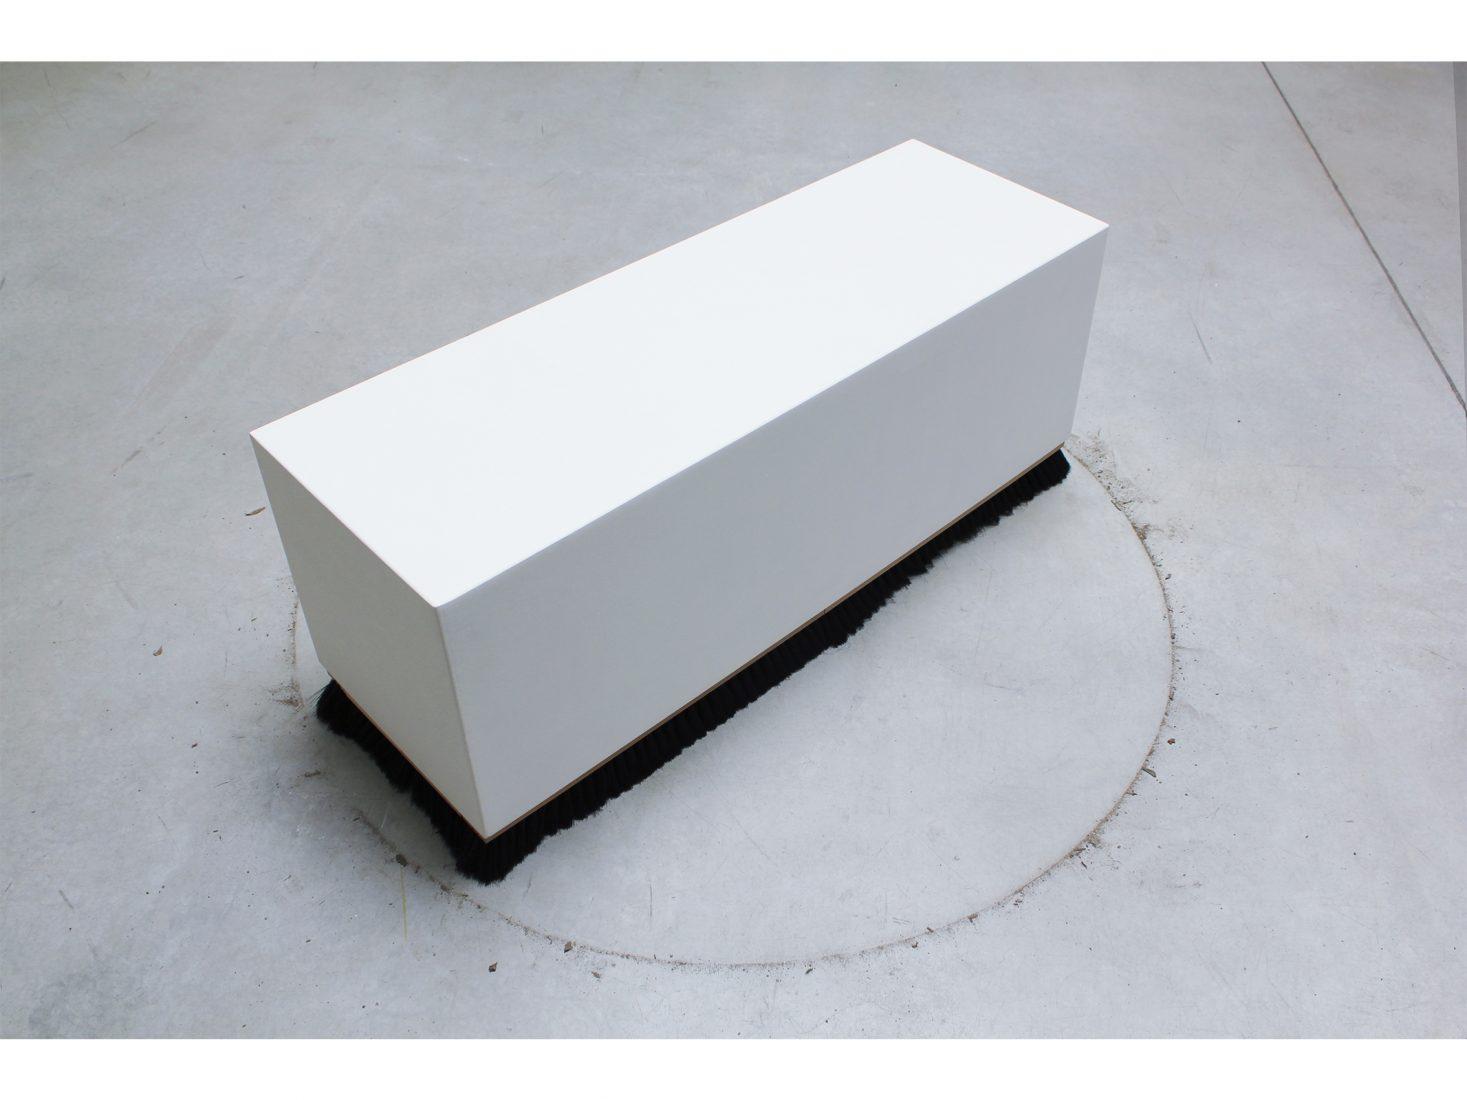 Michail Michailov. Pedestal #1, 2020, object, 48x120x40 cm